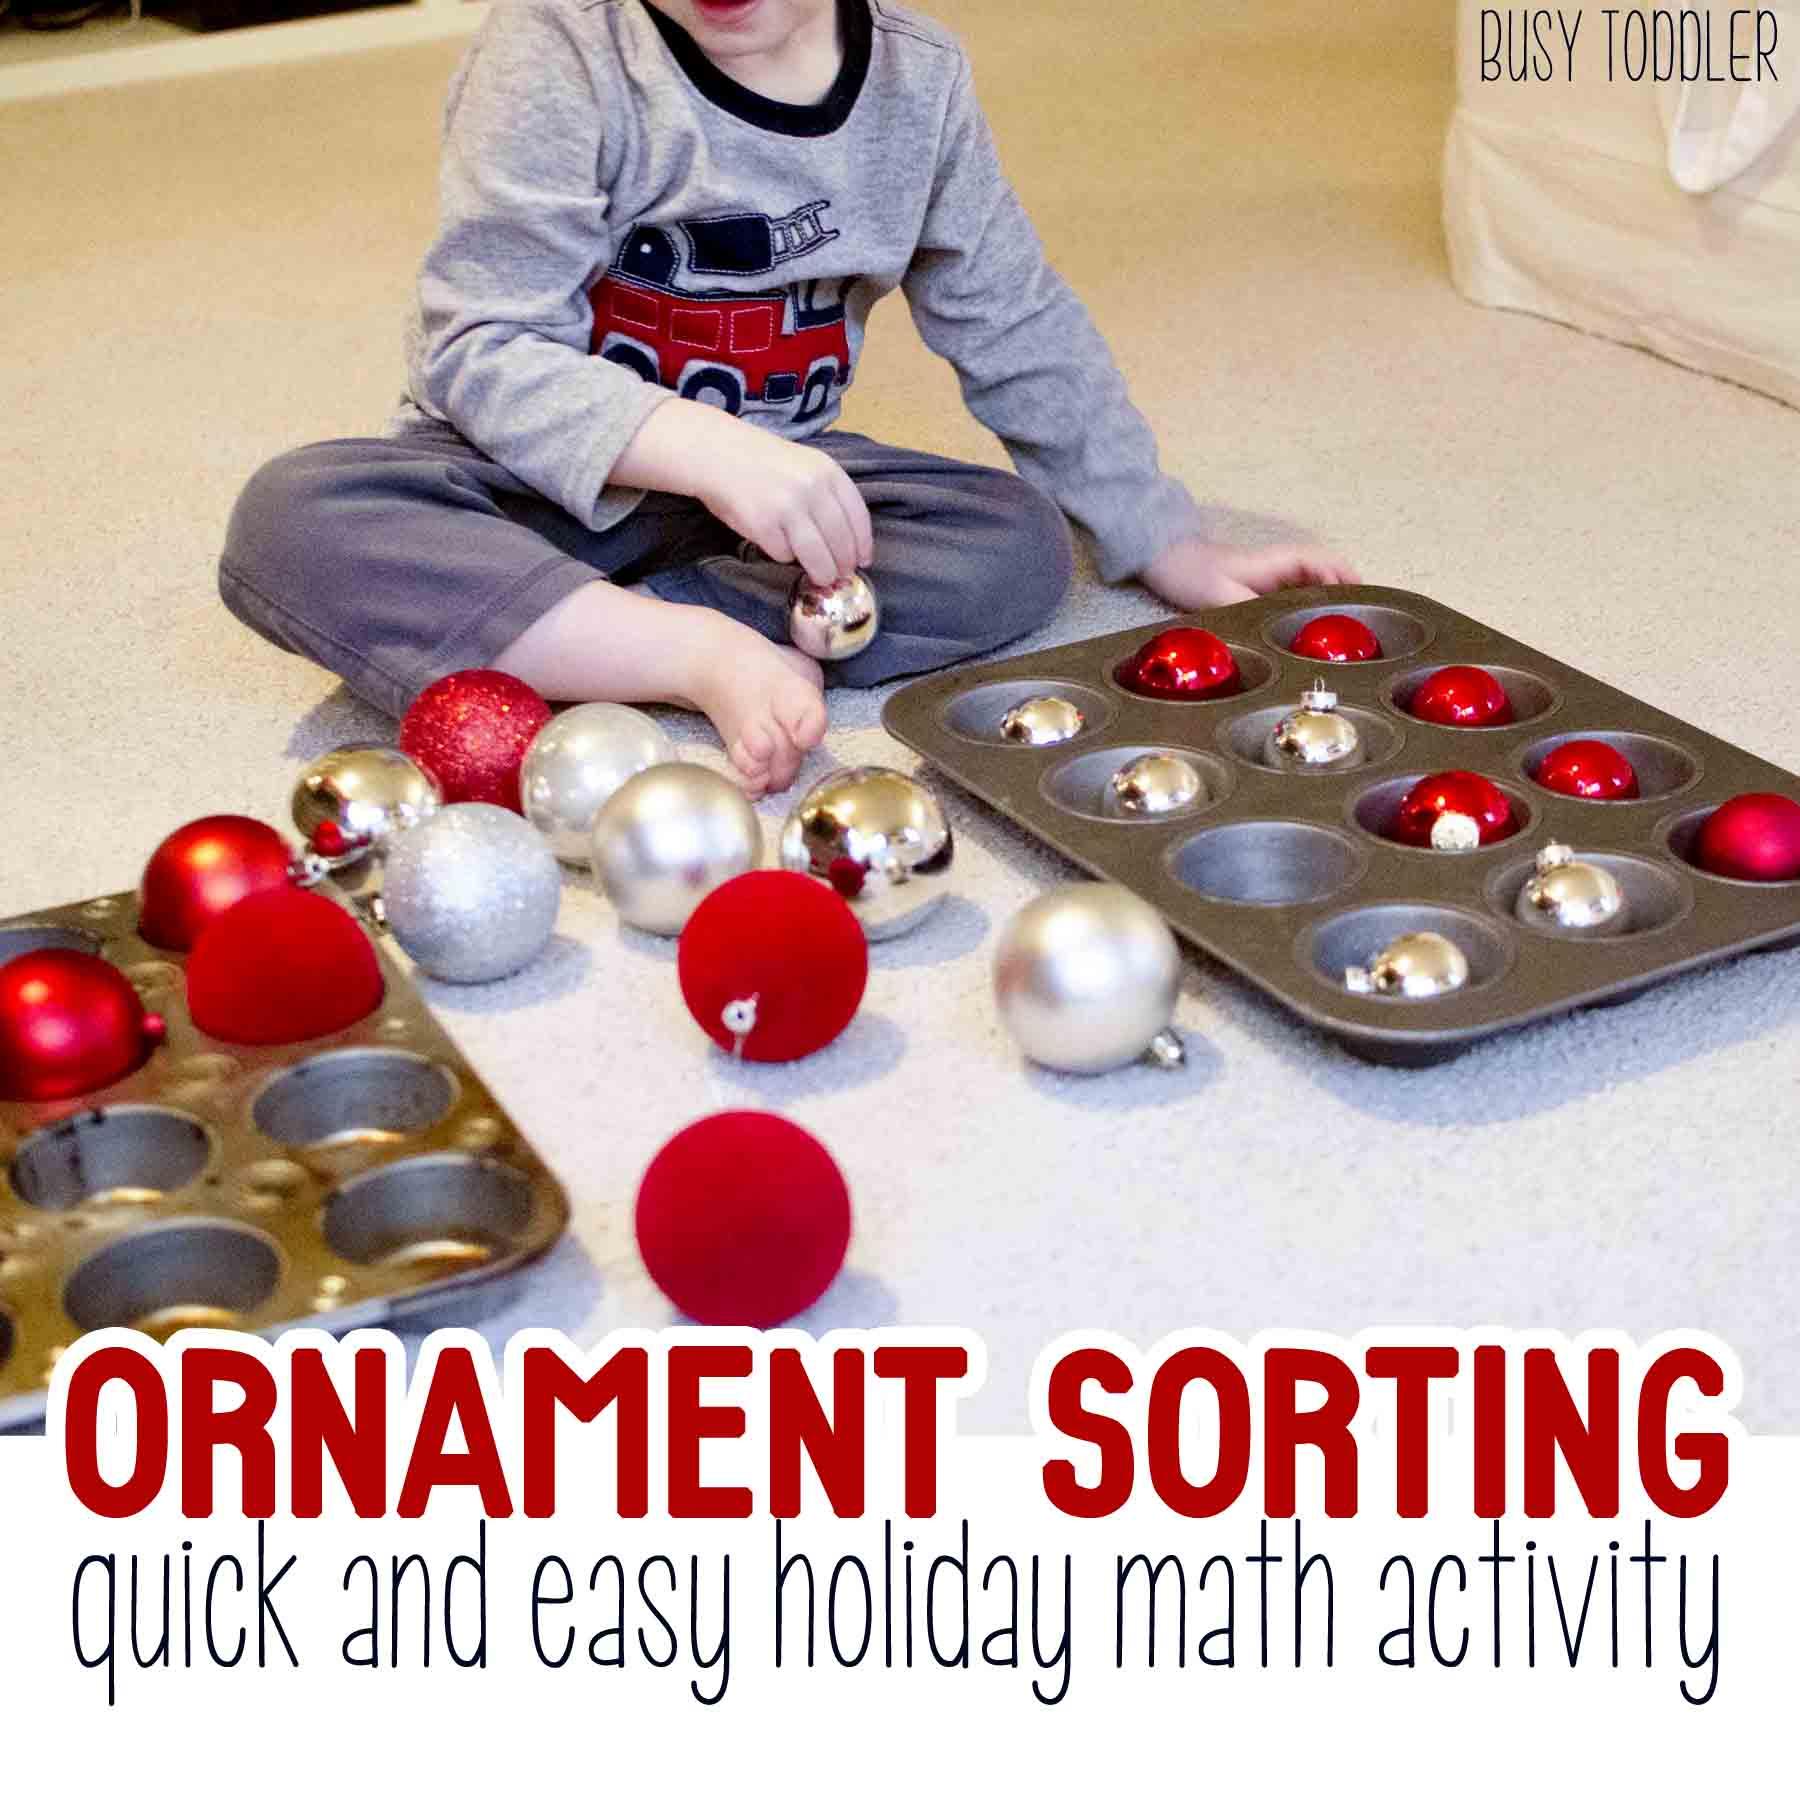 Ornament Sorting Holiday Math Activity